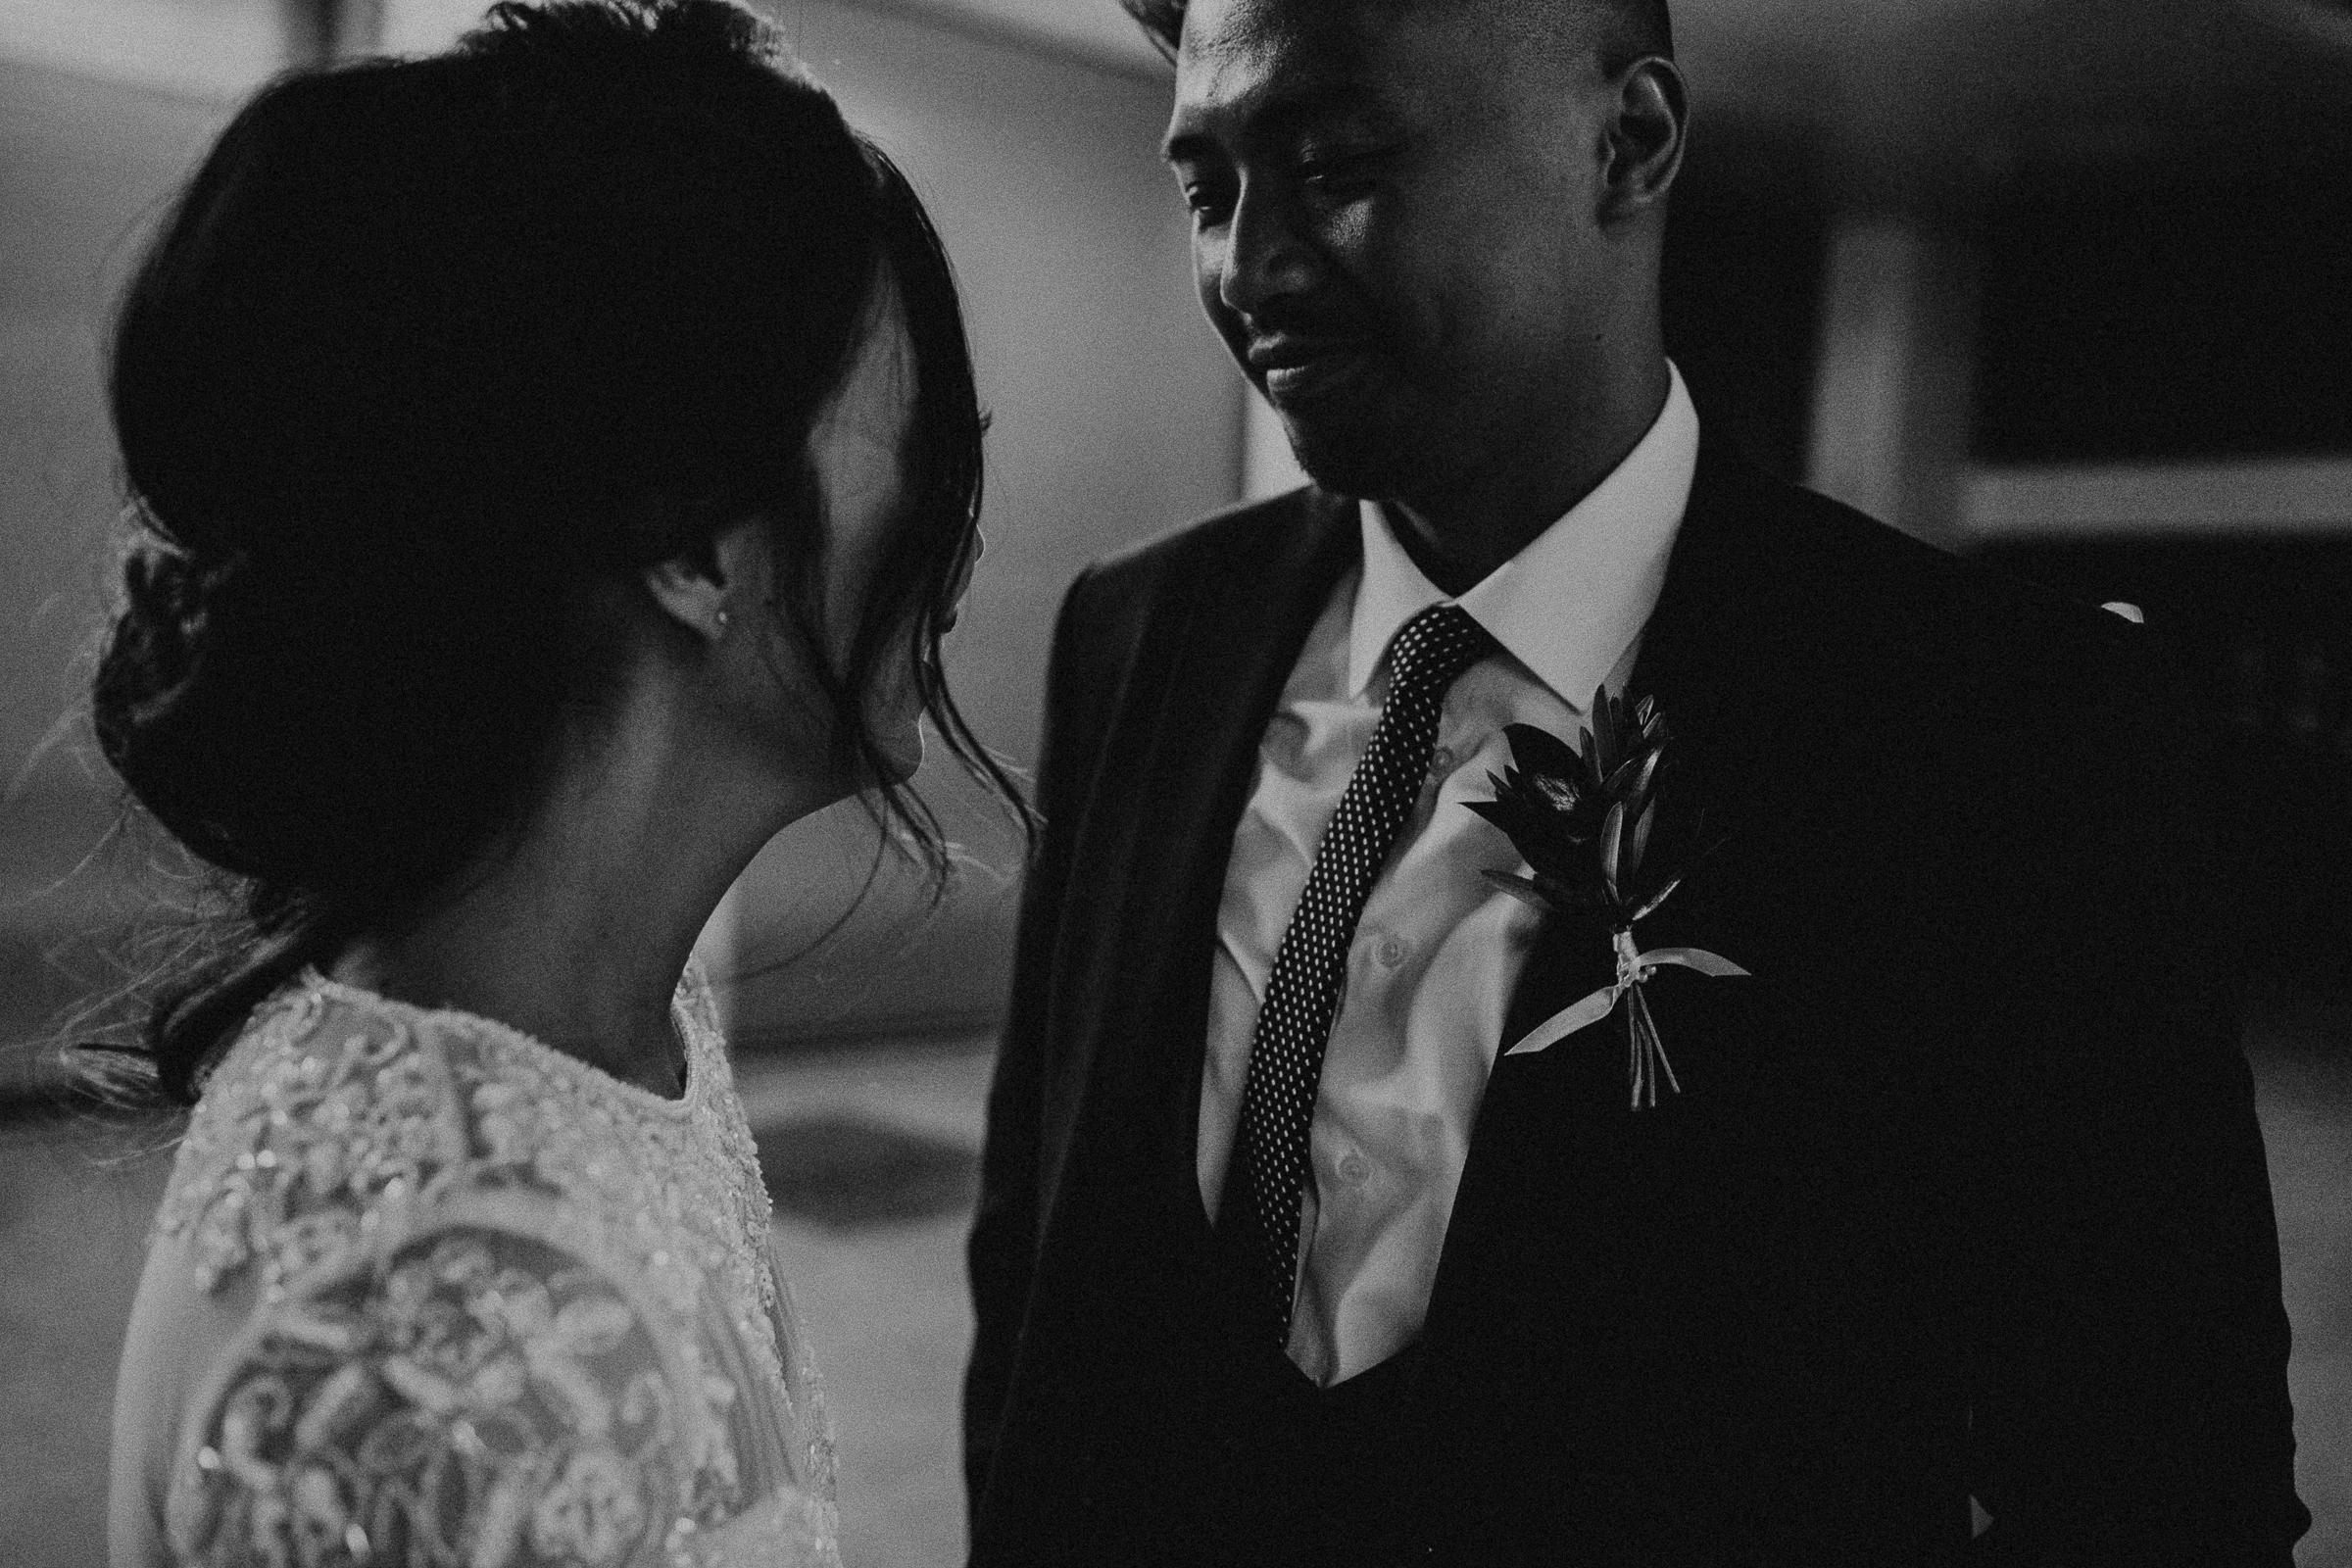 gretchen_gause_san_francisco_wedding_photo-78.jpg